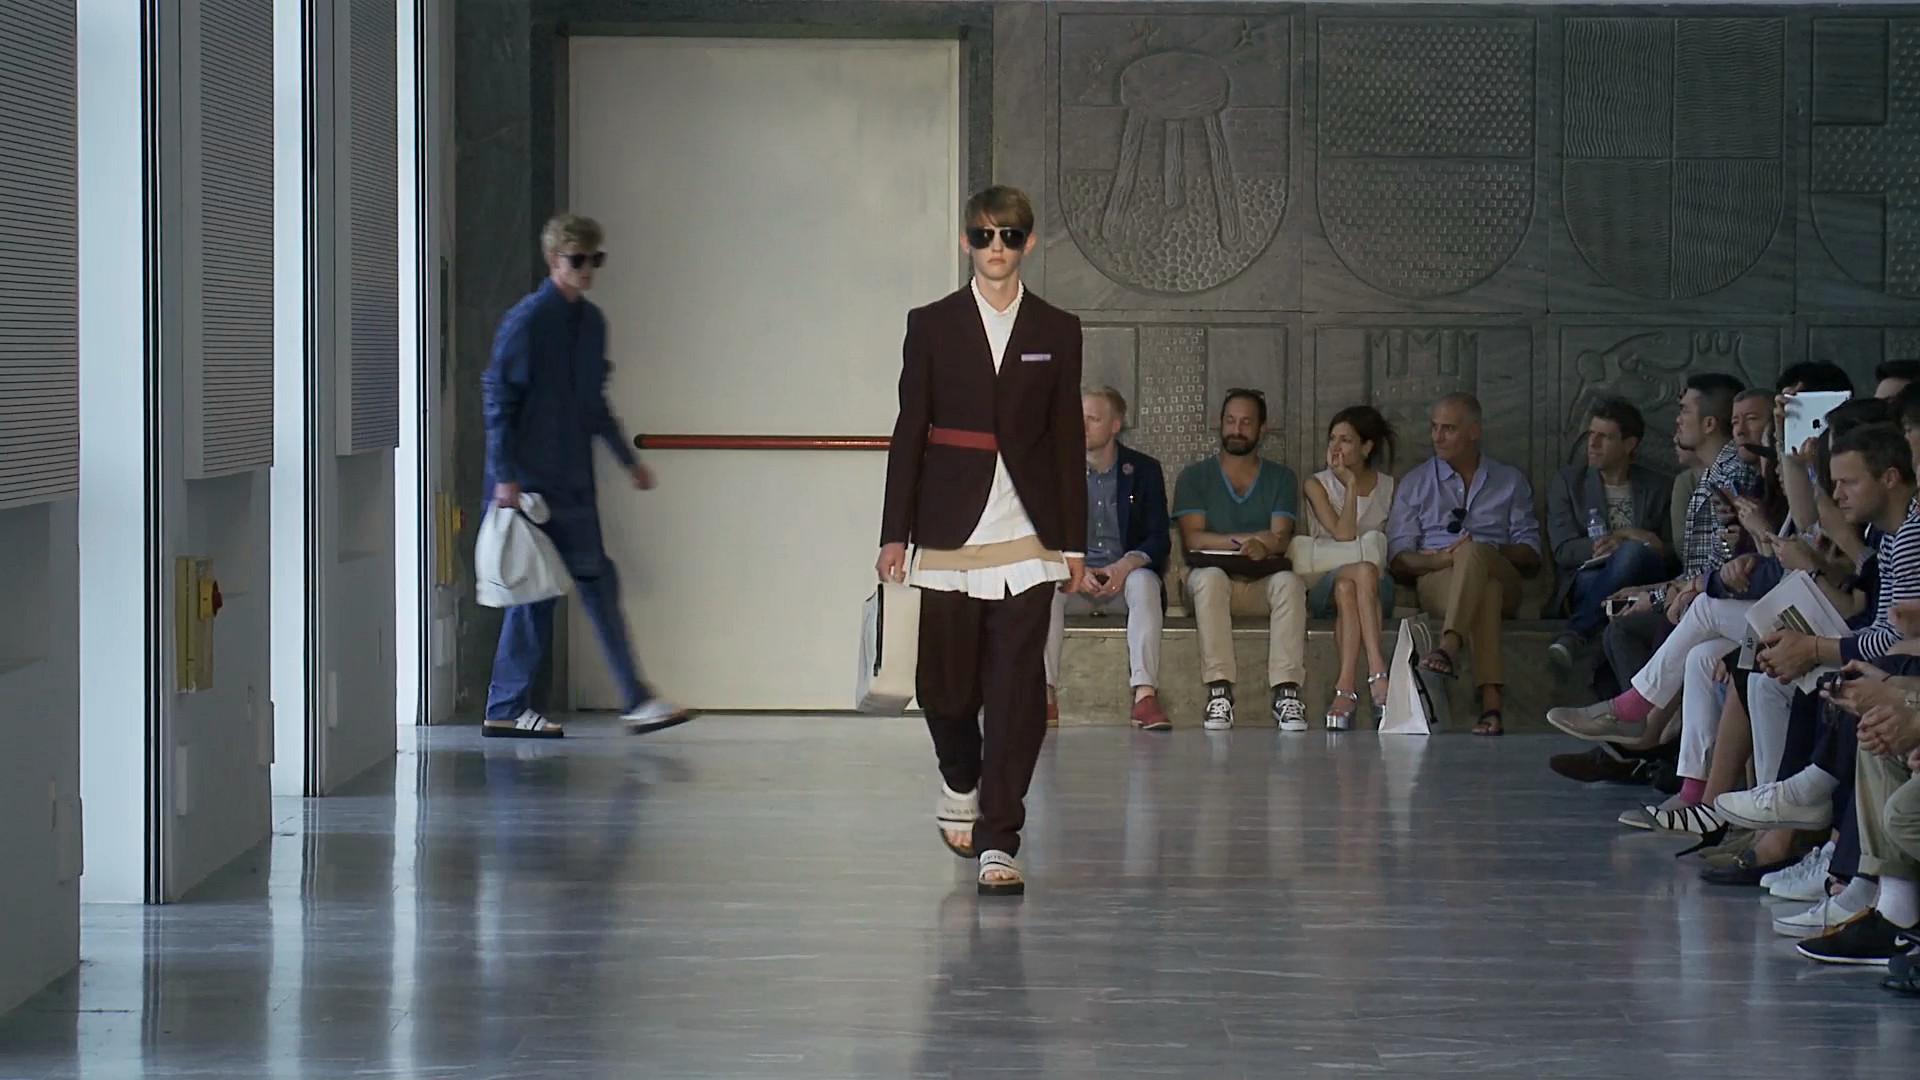 Andrea Pompilio Spring Summer 2015 Men's Fashion Show - Milano Fashion Week